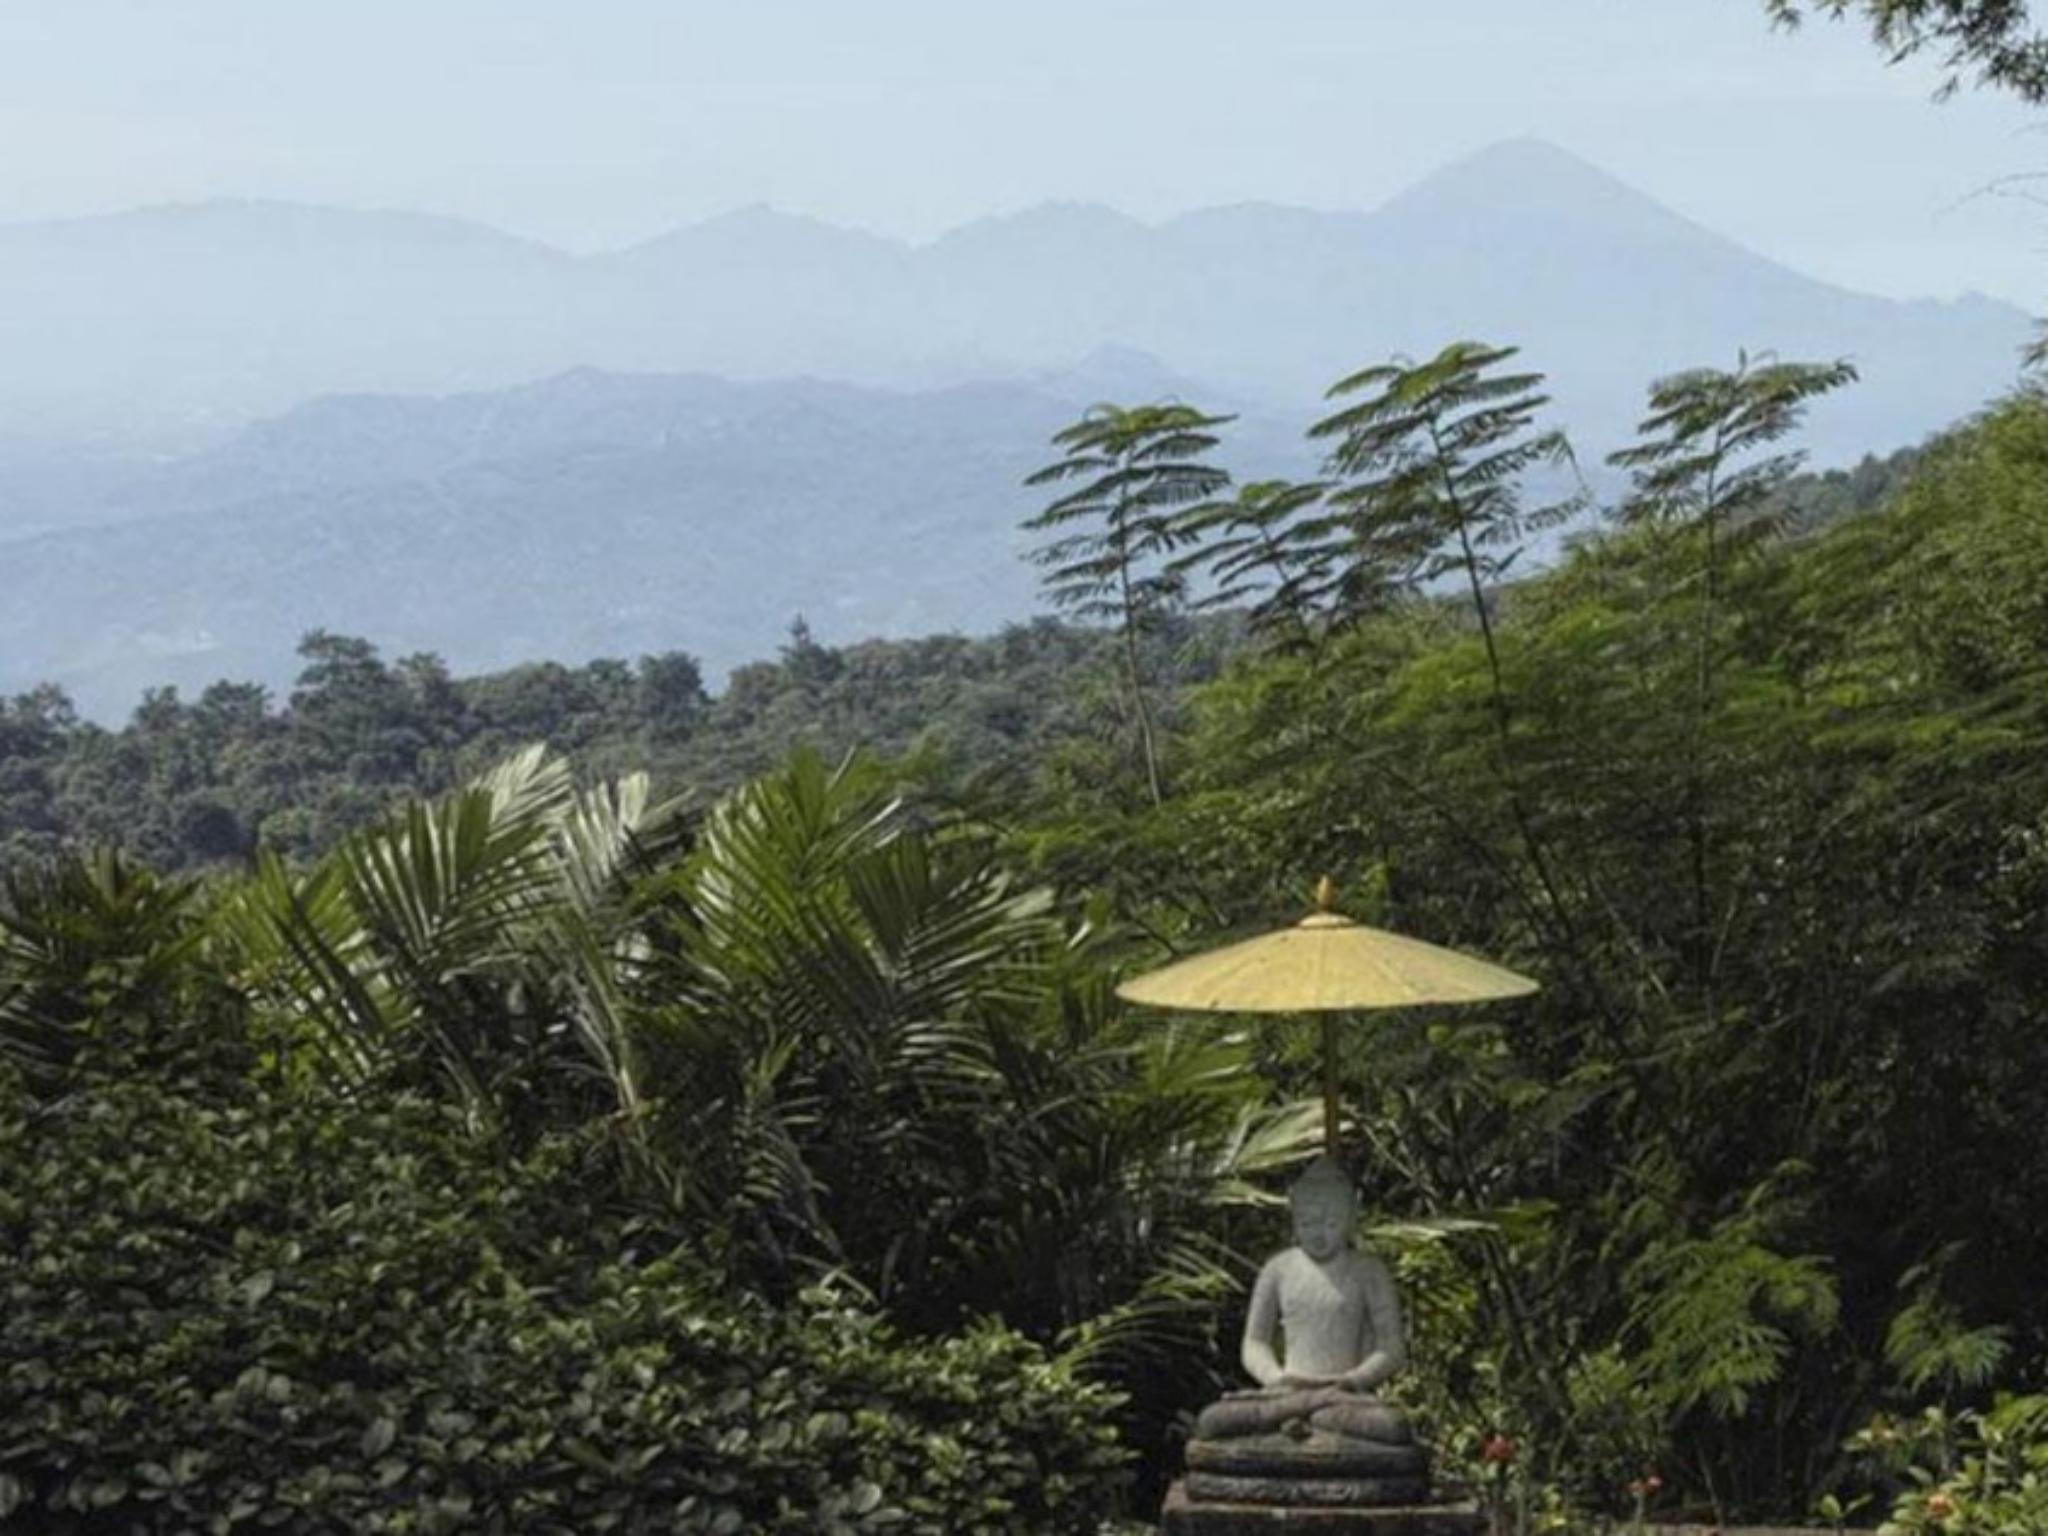 Kaliandra Sejati Eco Resort, Pasuruan